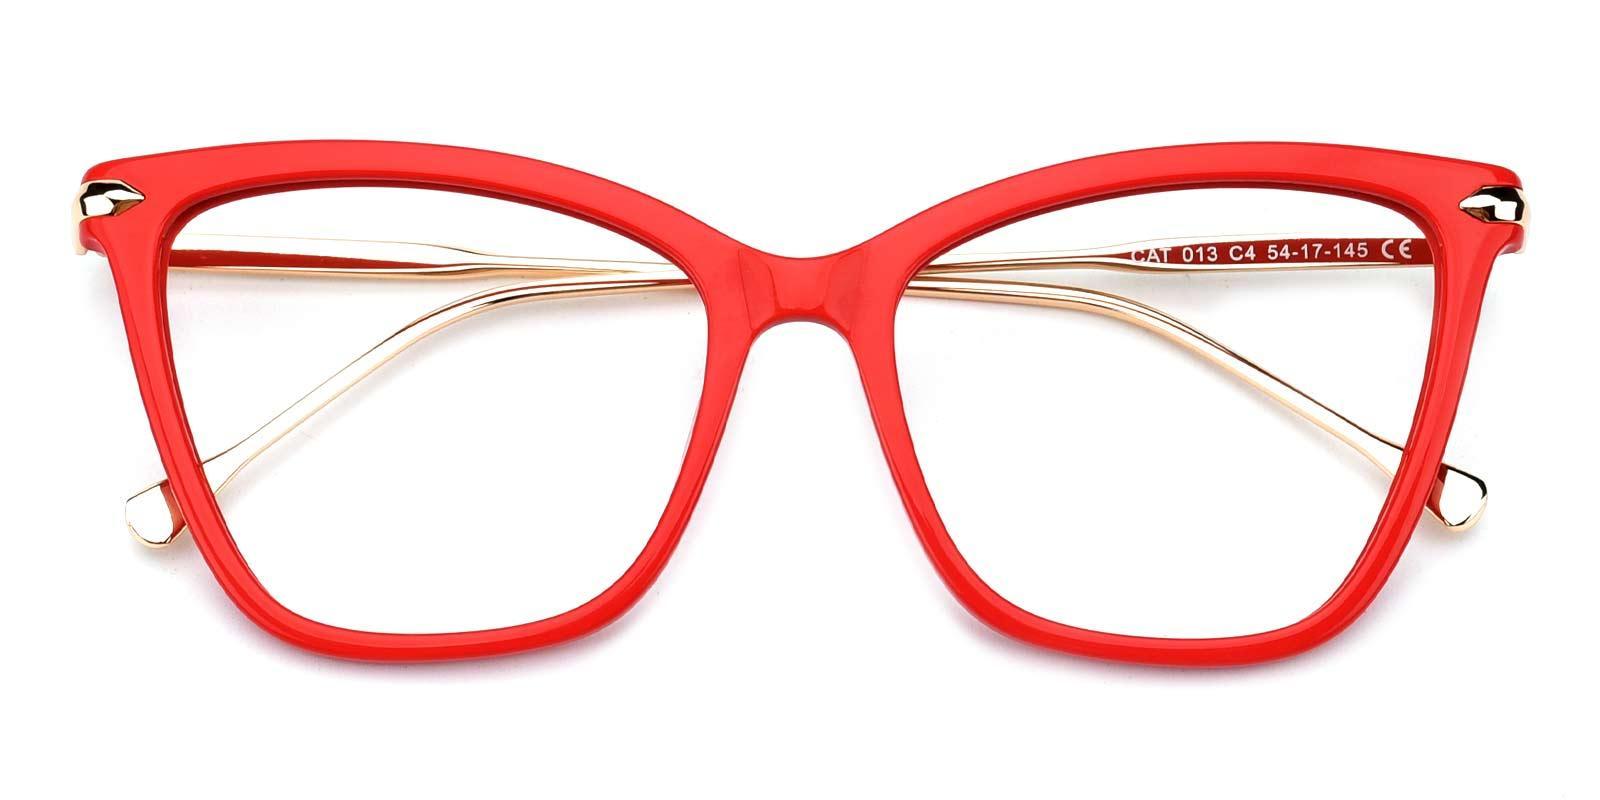 Queenie-Red-Cat-Combination-Eyeglasses-detail